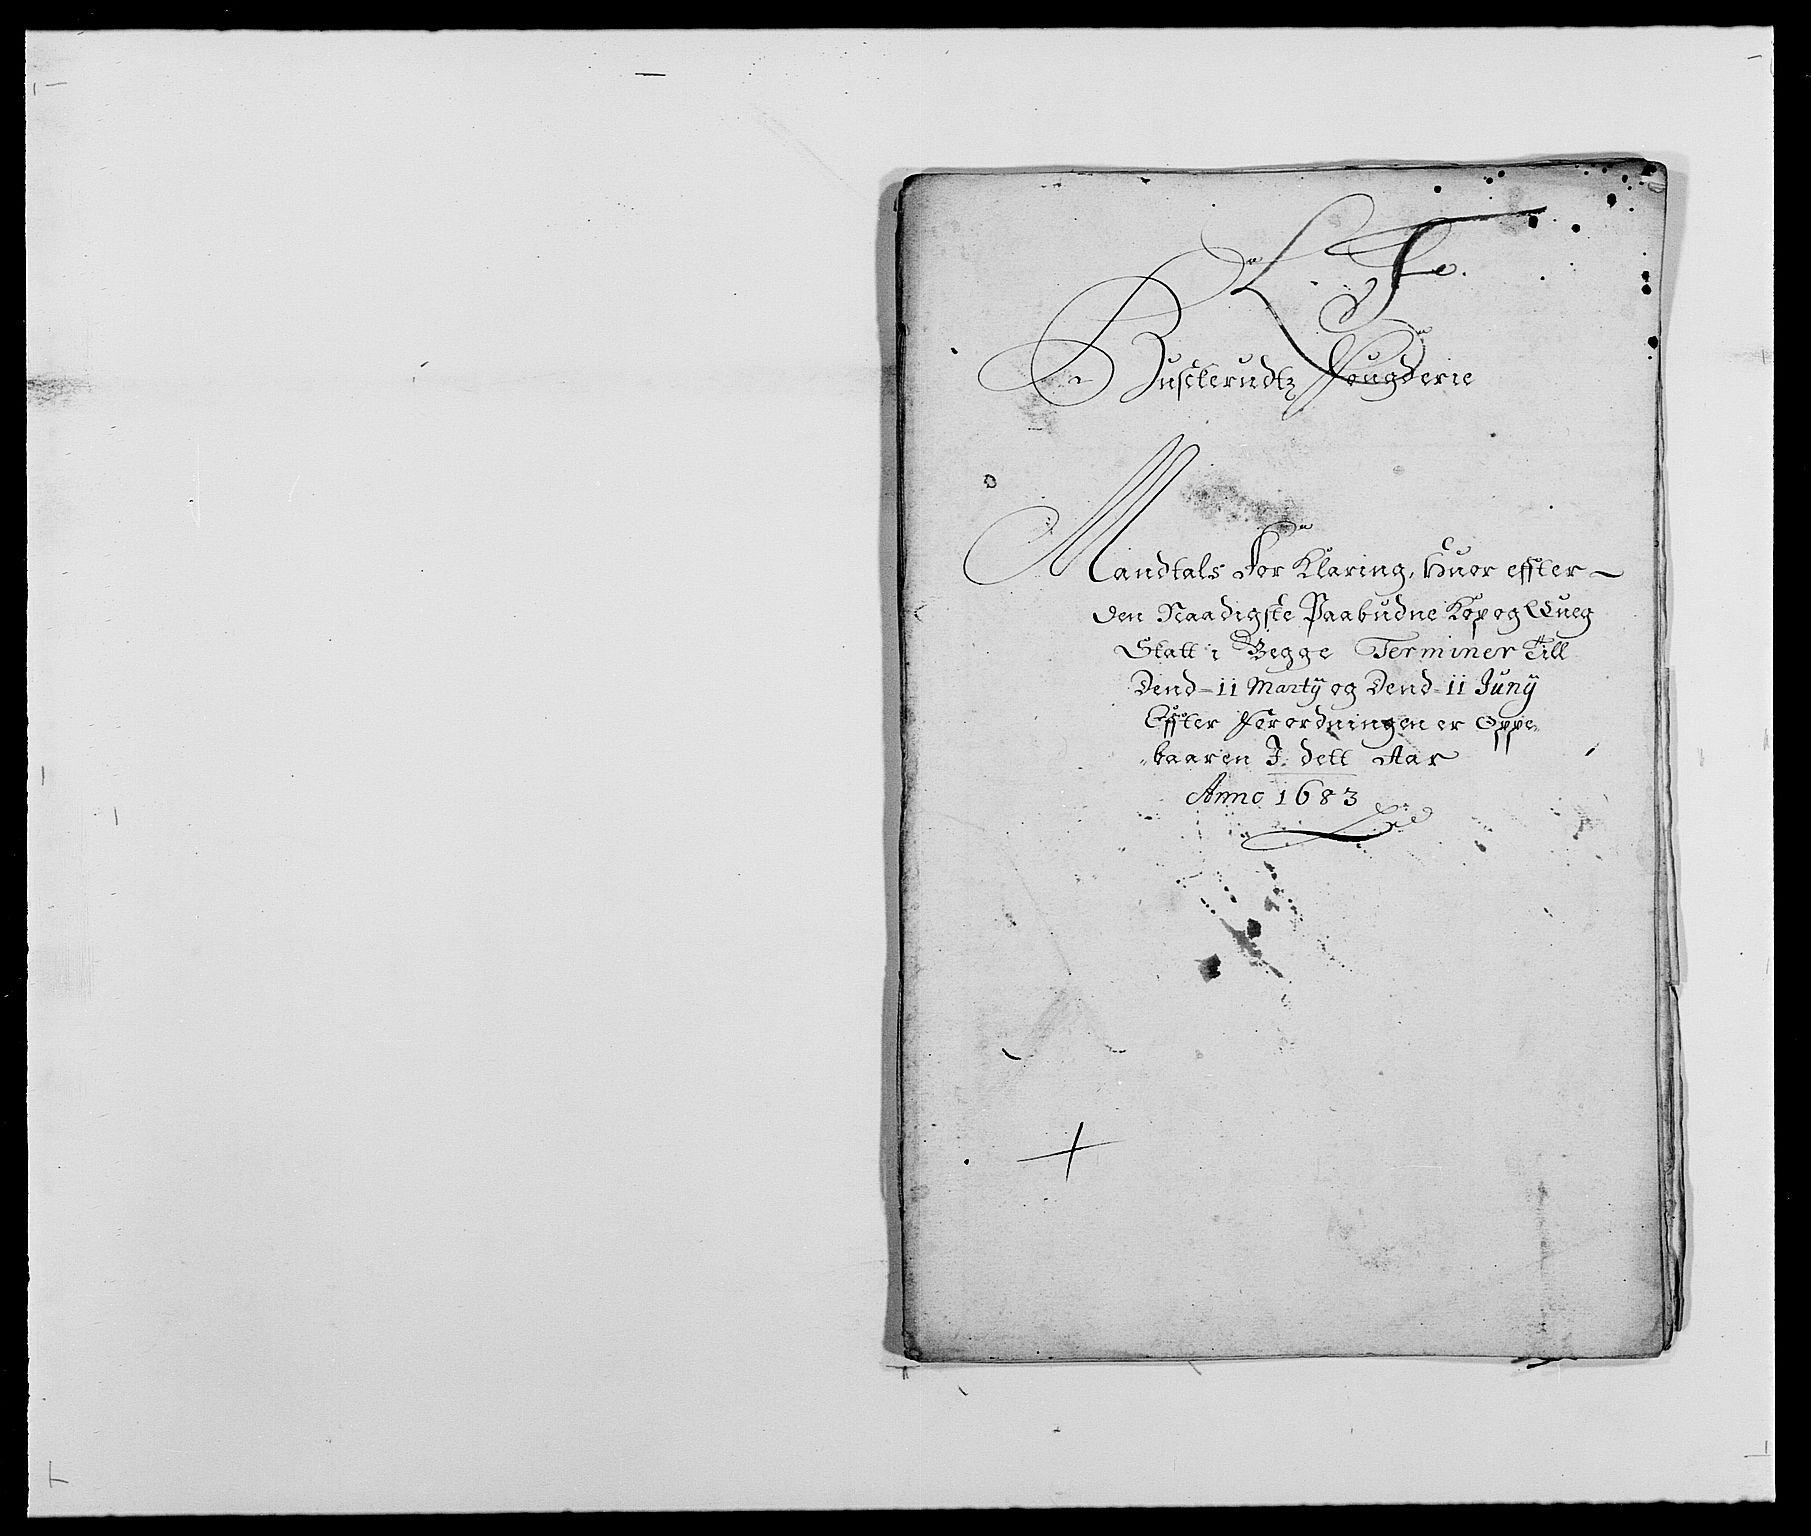 RA, Rentekammeret inntil 1814, Reviderte regnskaper, Fogderegnskap, R25/L1677: Fogderegnskap Buskerud, 1683-1684, s. 123